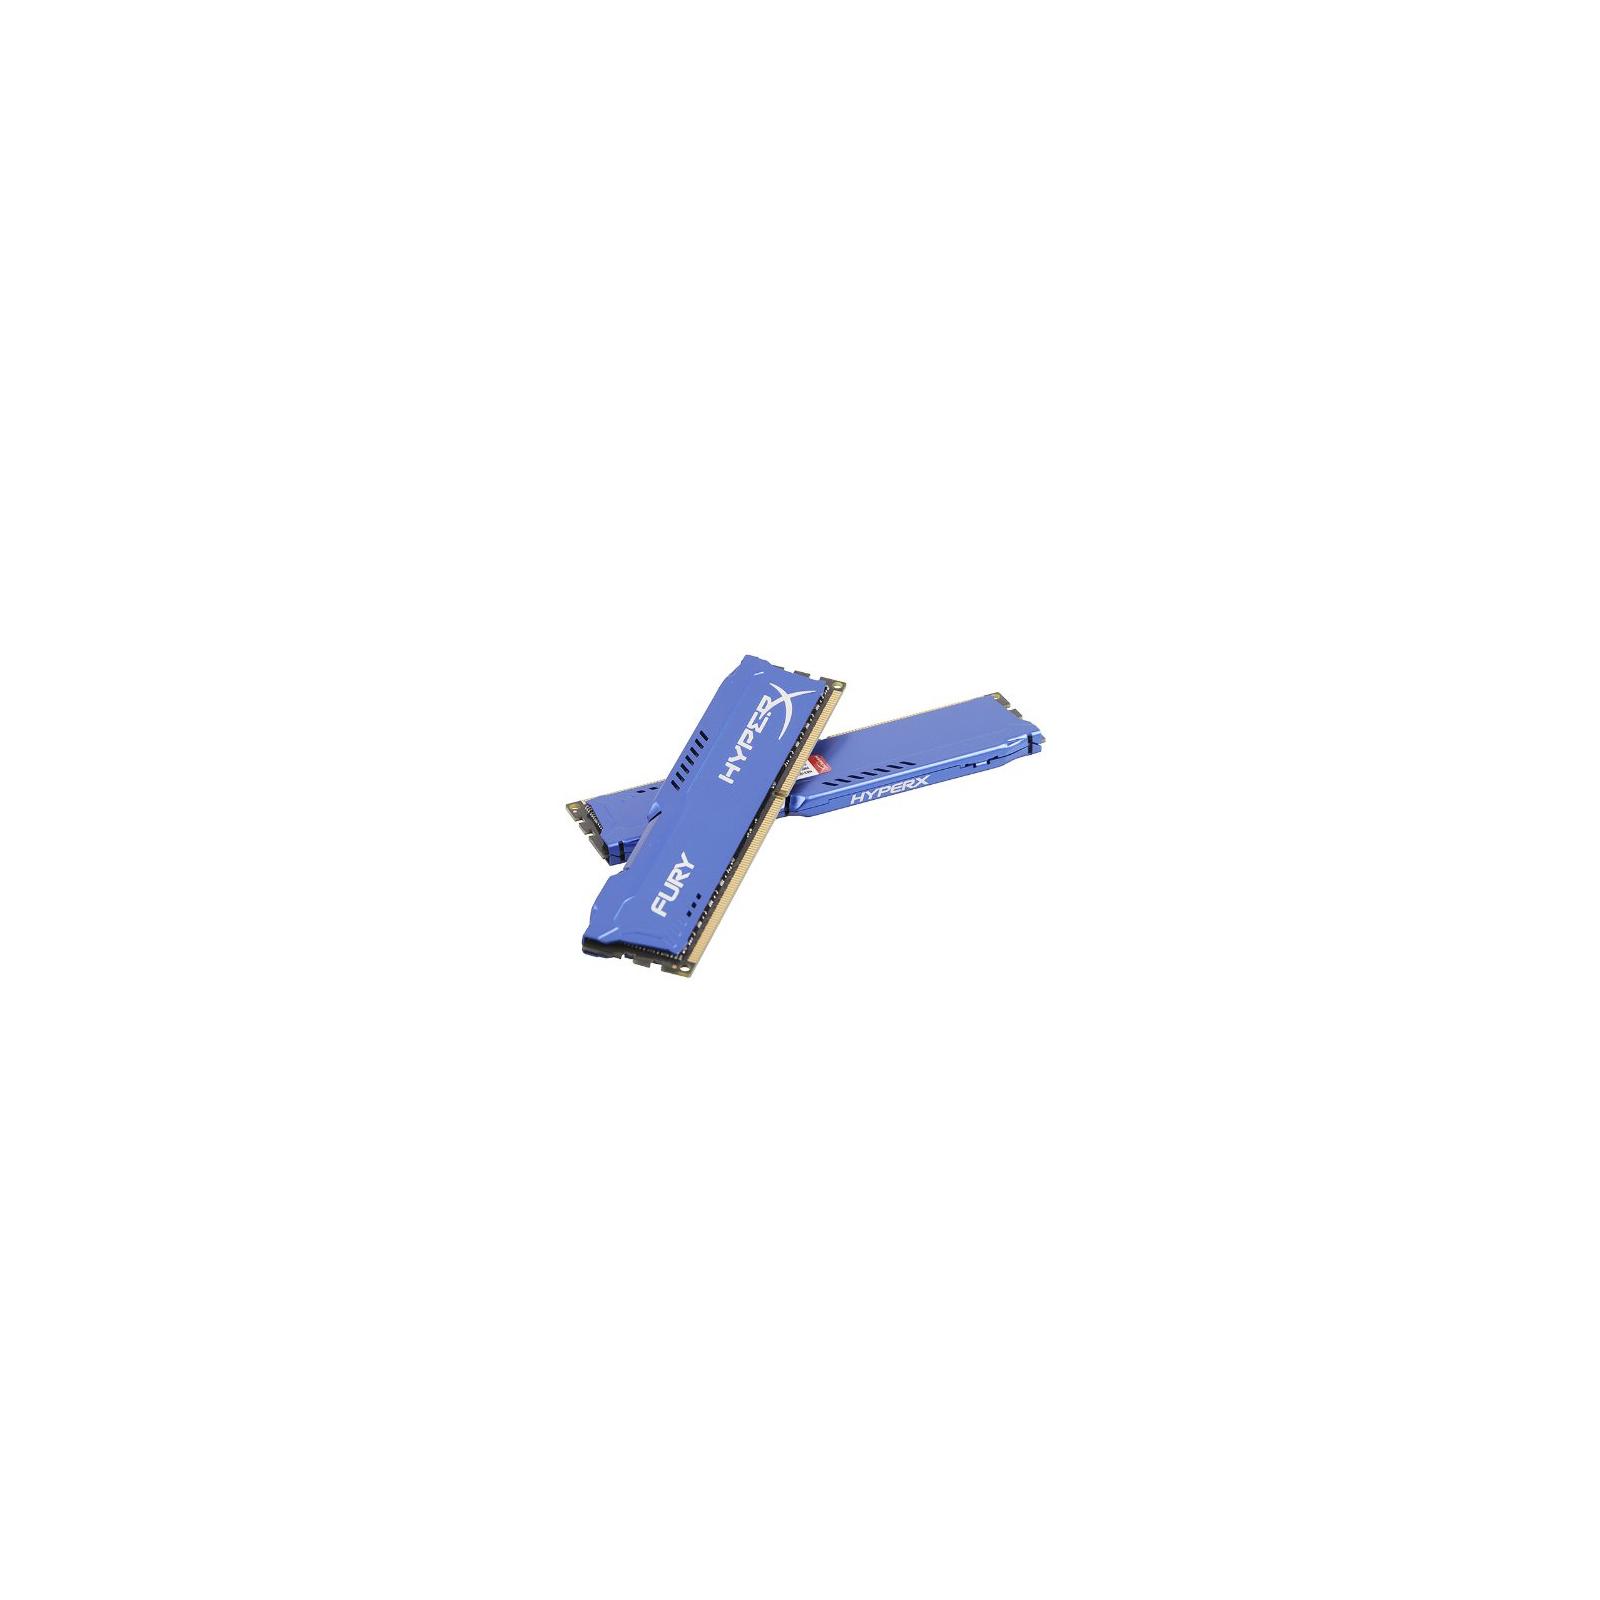 Модуль памяти для компьютера DDR3 8Gb (2x4GB) 1600 MHz HyperX Fury Blu Kingston (HX316C10FK2/8) изображение 5